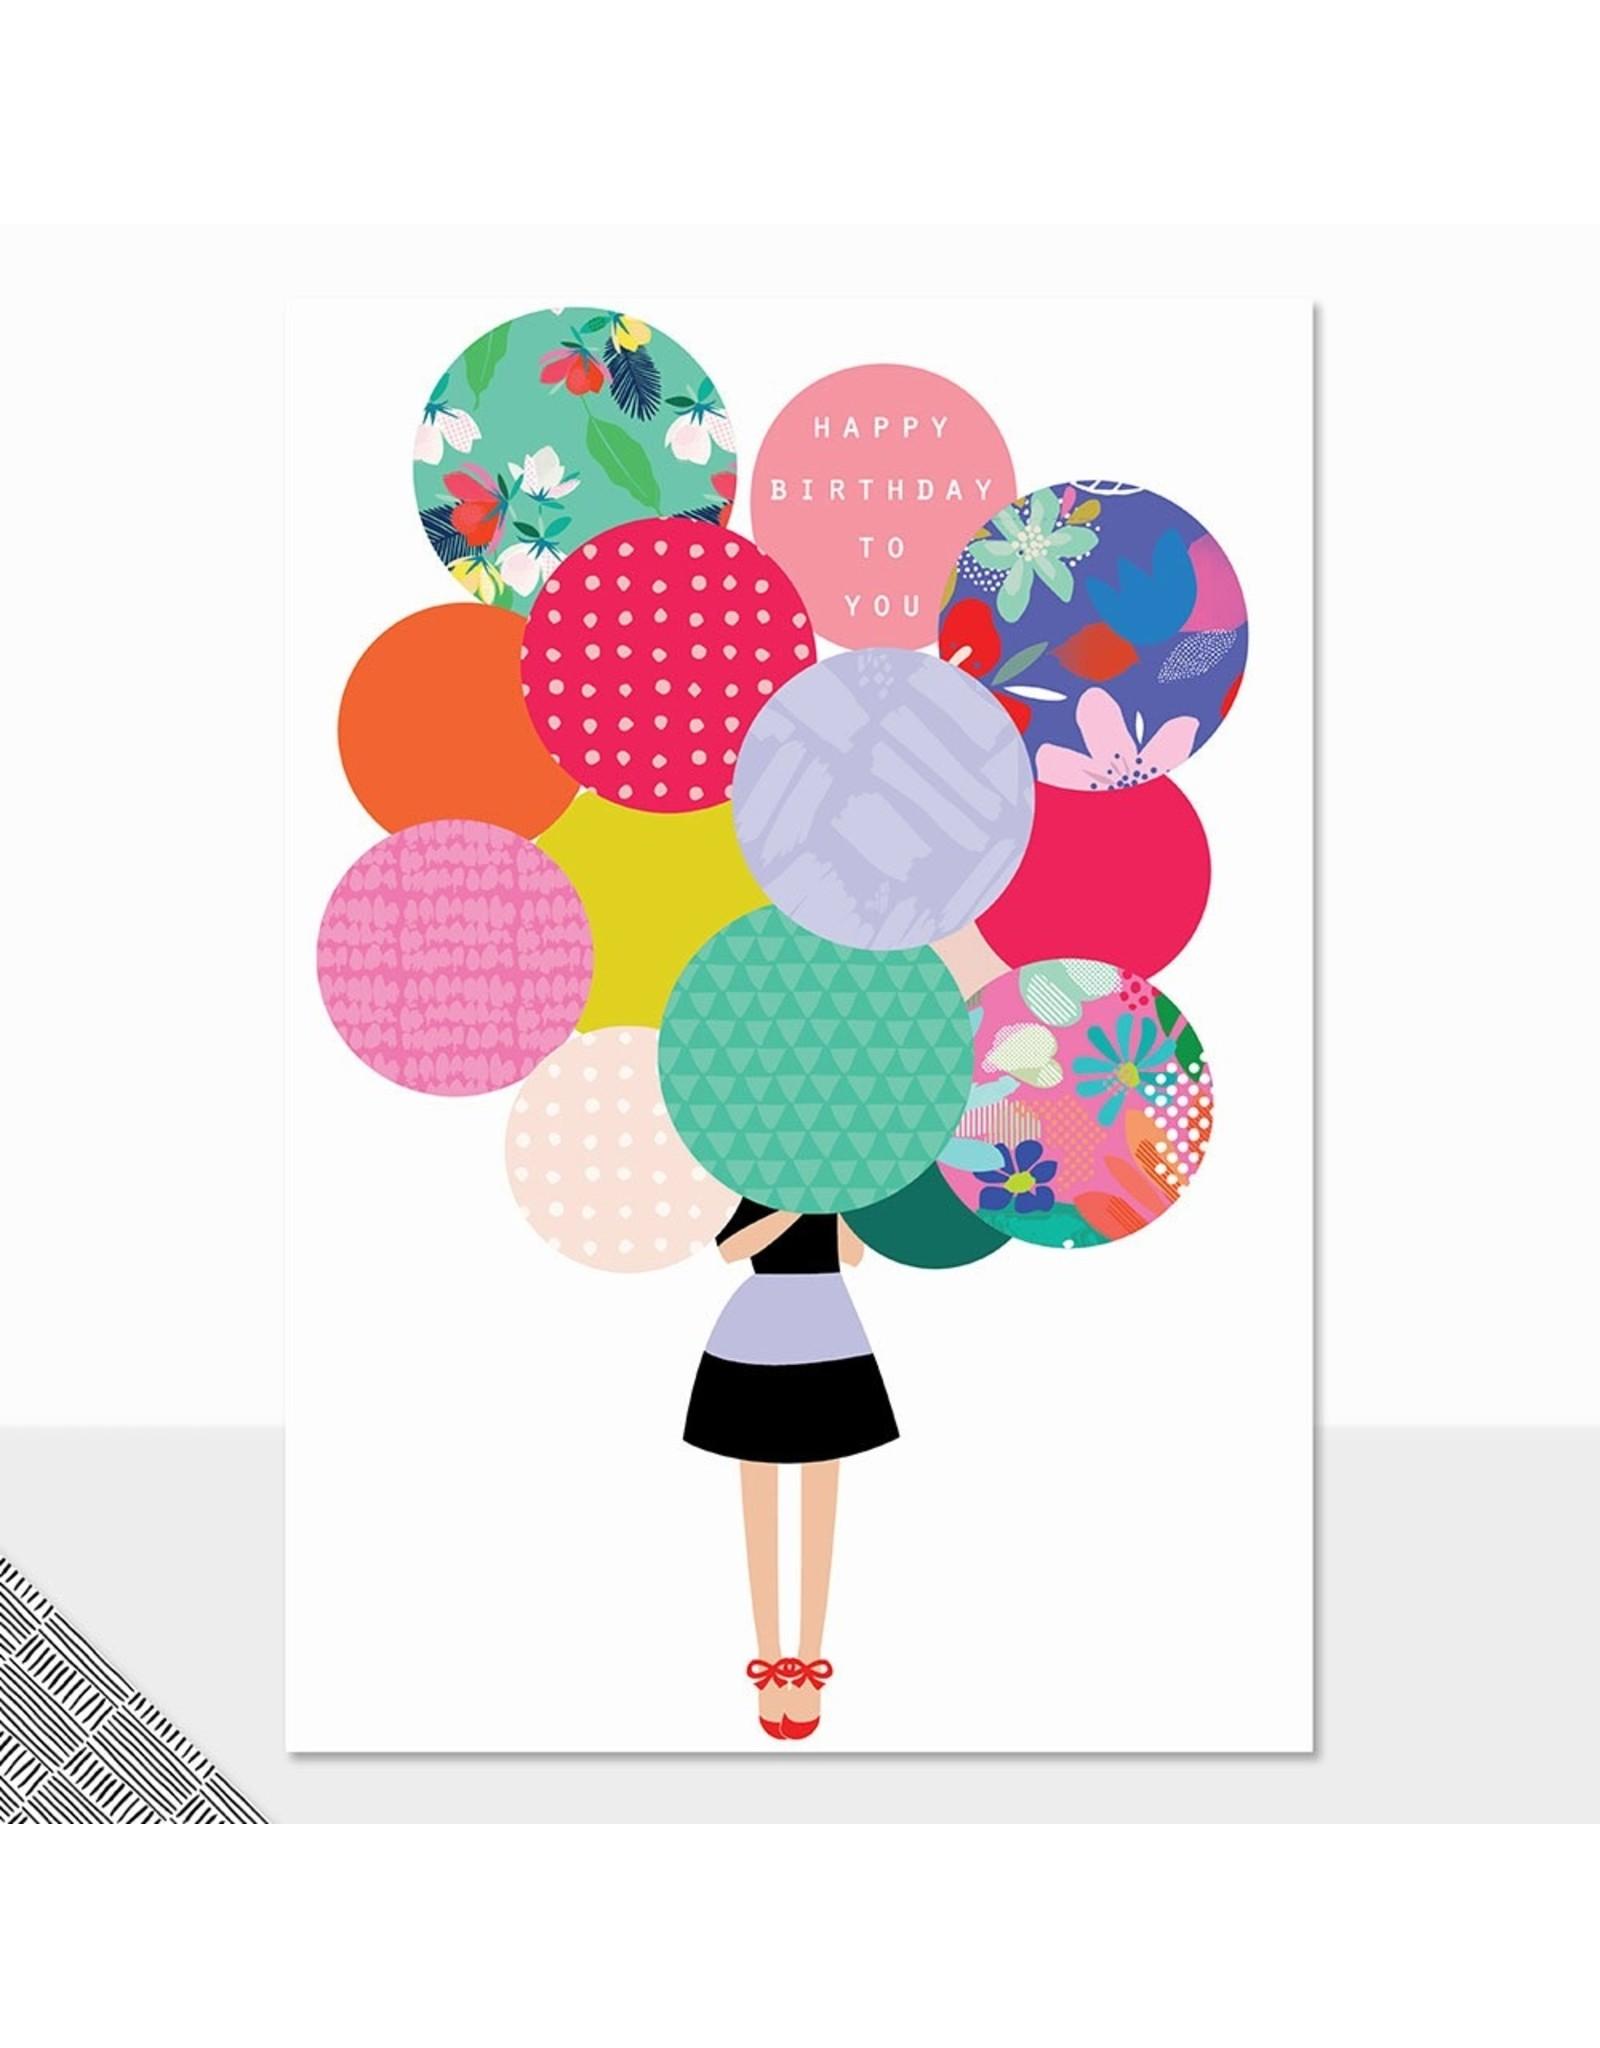 Birthday - Happy Birthday to You - Balloons